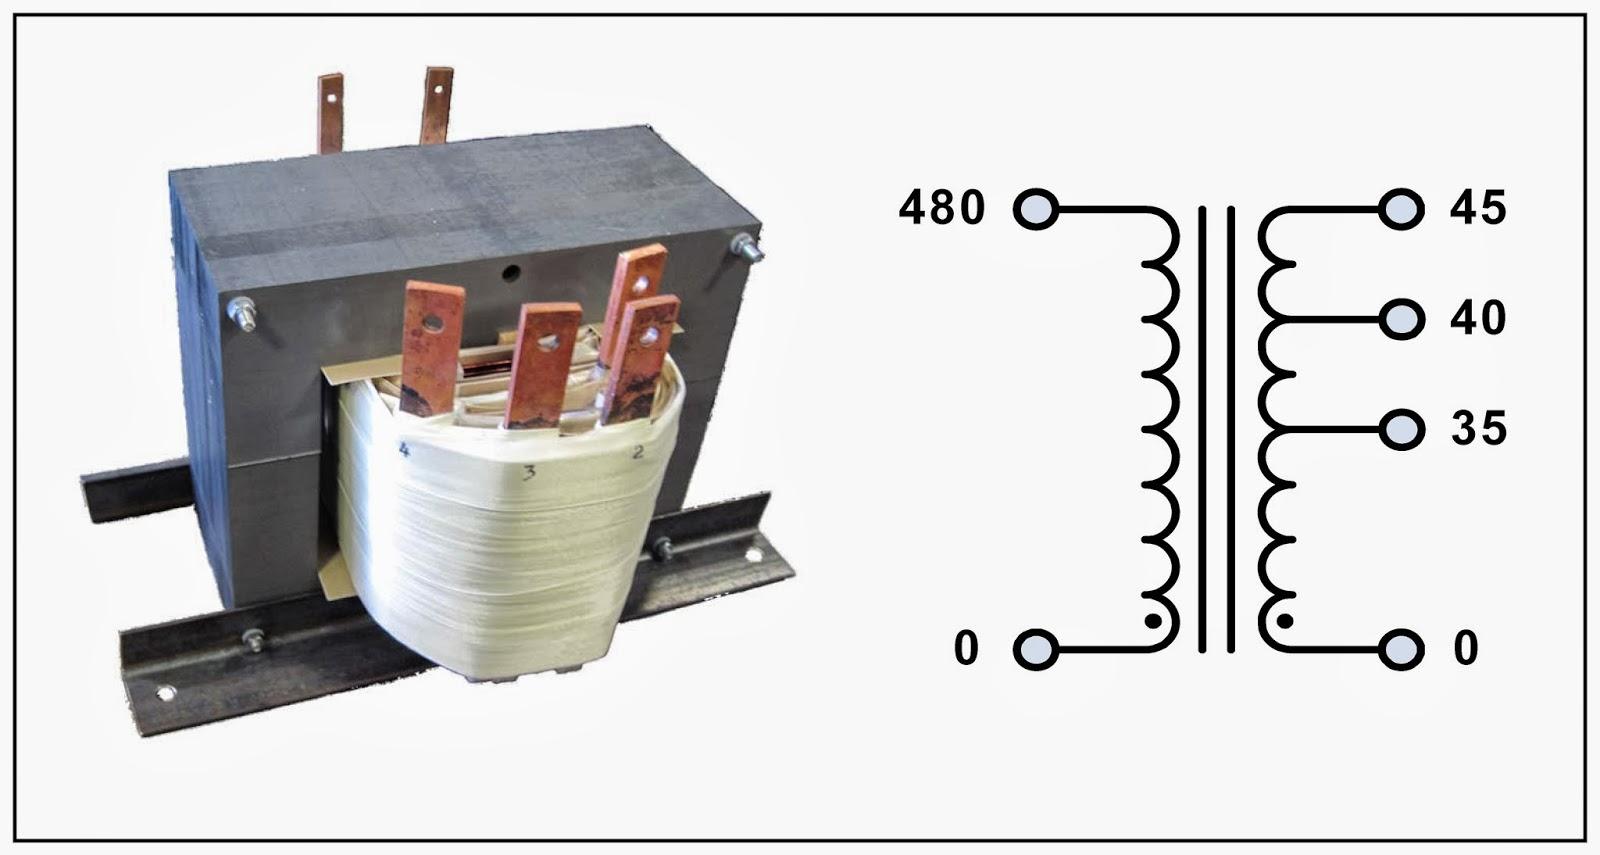 L C Magnetics October 2013 45 Kva Transformer Wiring Diagram Tap 12 P N 18828n Input 480 Vac Output 35 40